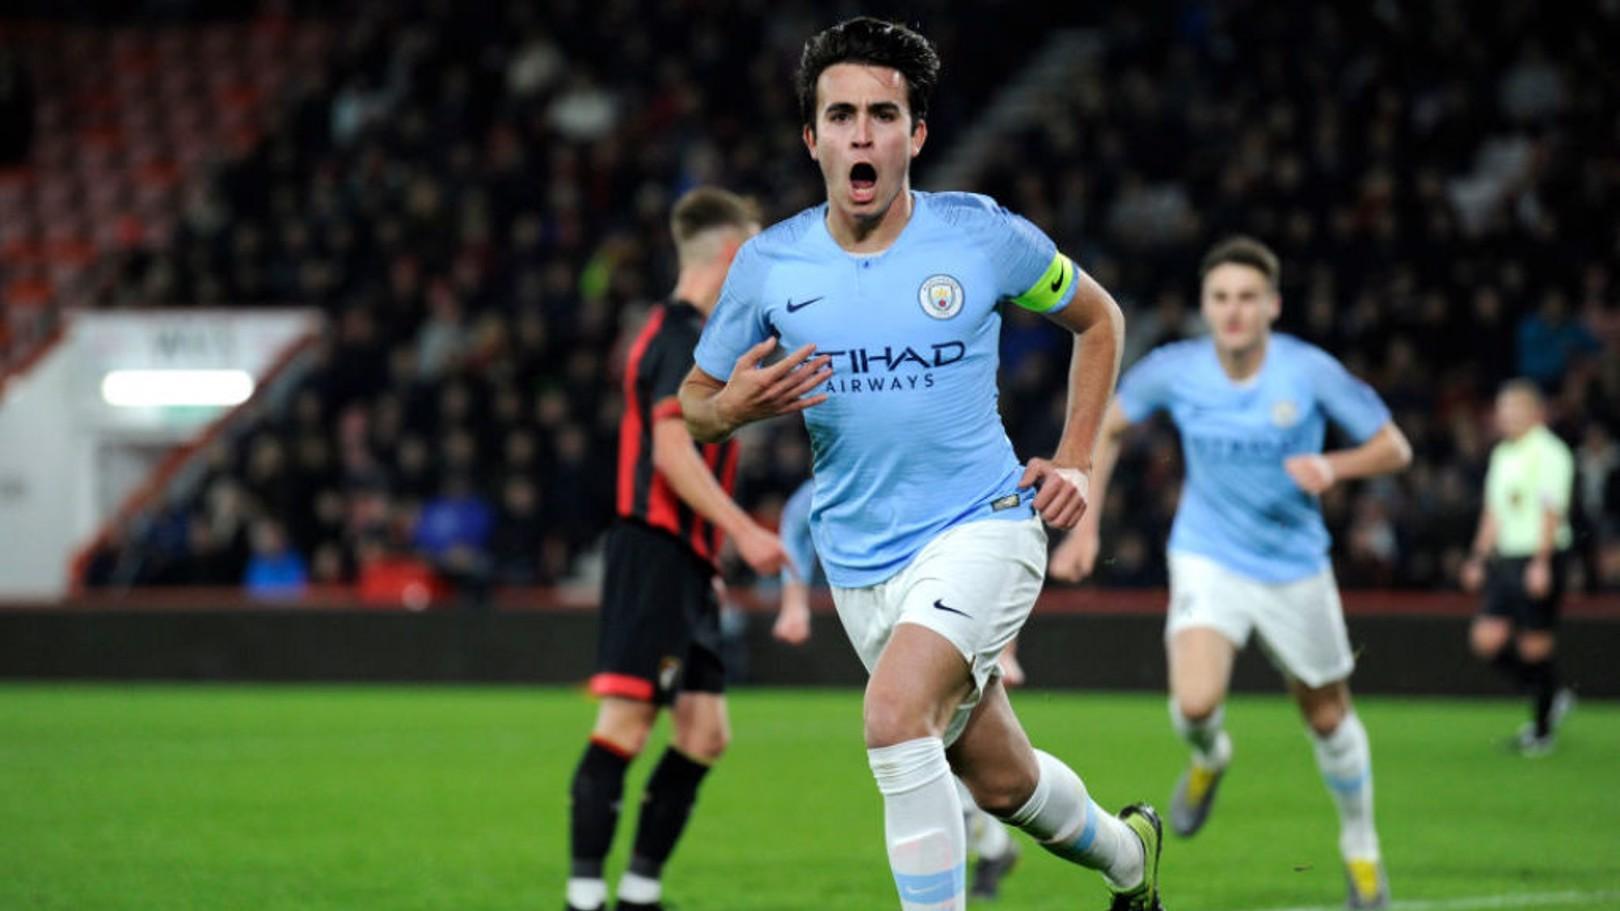 Garcia: FA Youth Cup glory would cap dream season